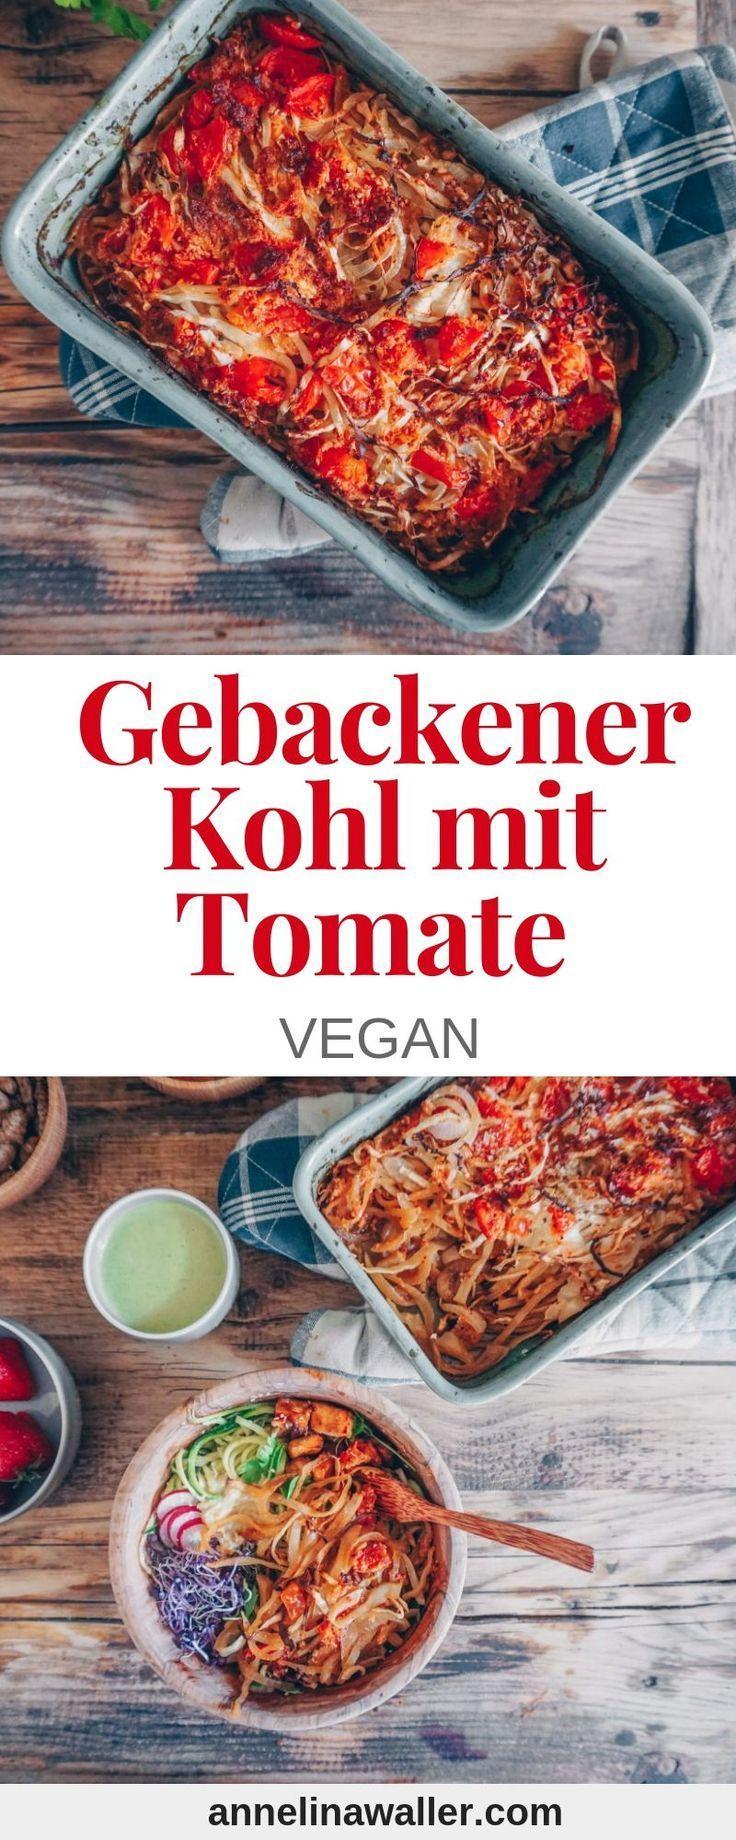 Simple baked cabbage with tomato, vegan recipes german, vegan recipes With ...   - Abnehmen Rezepte einfach - #Abnehmen #baked #cabbage #Einfach #German #recipes #rezepte #simple #Tomato #vegan #veganerezeptemittag